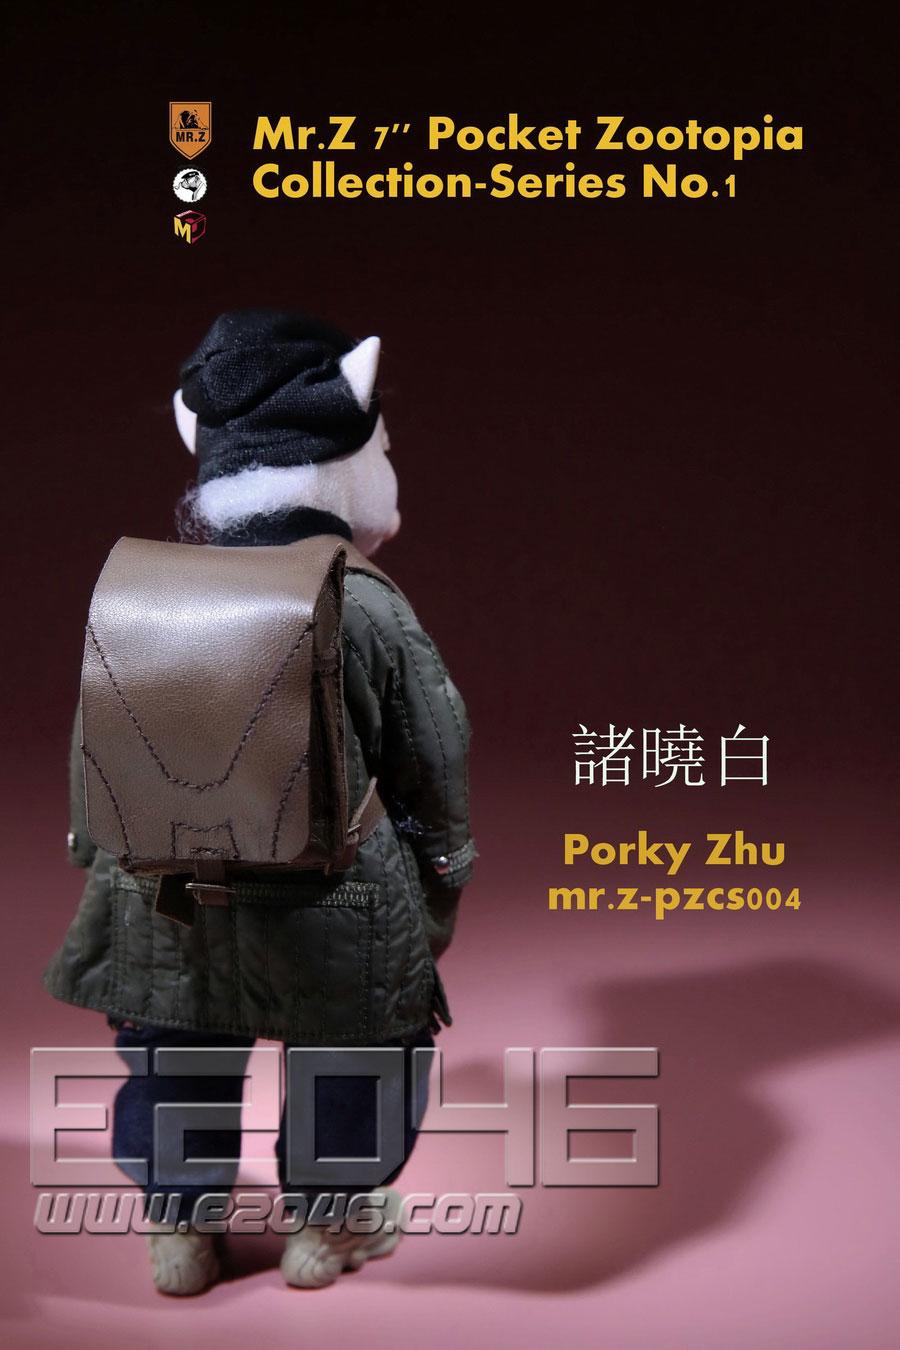 Porky Zhu (DOLL)